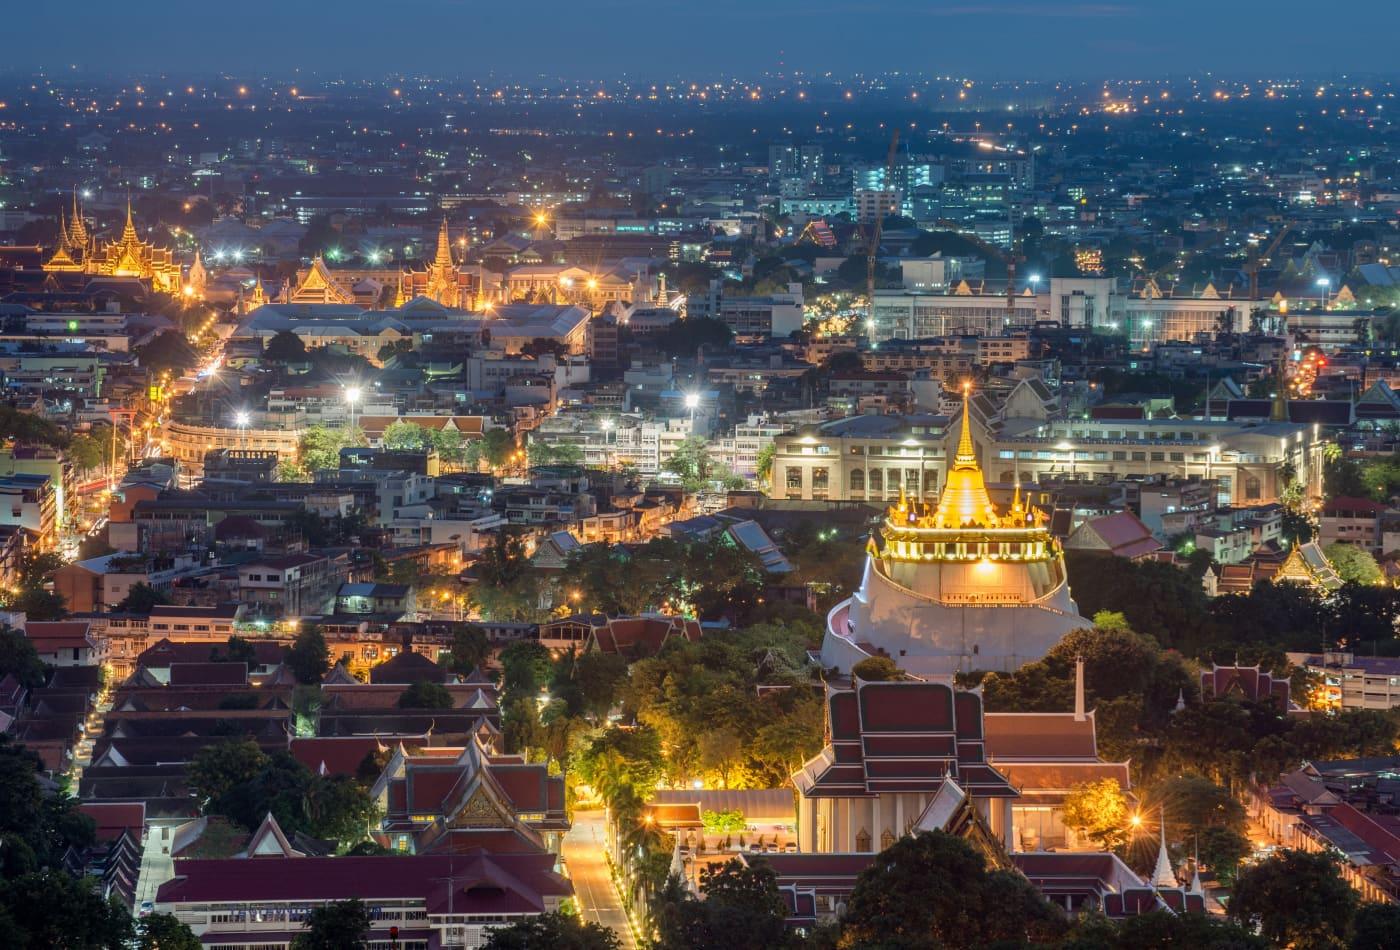 Chinese investors are spending billions on Thai property despite a turbulent political scene